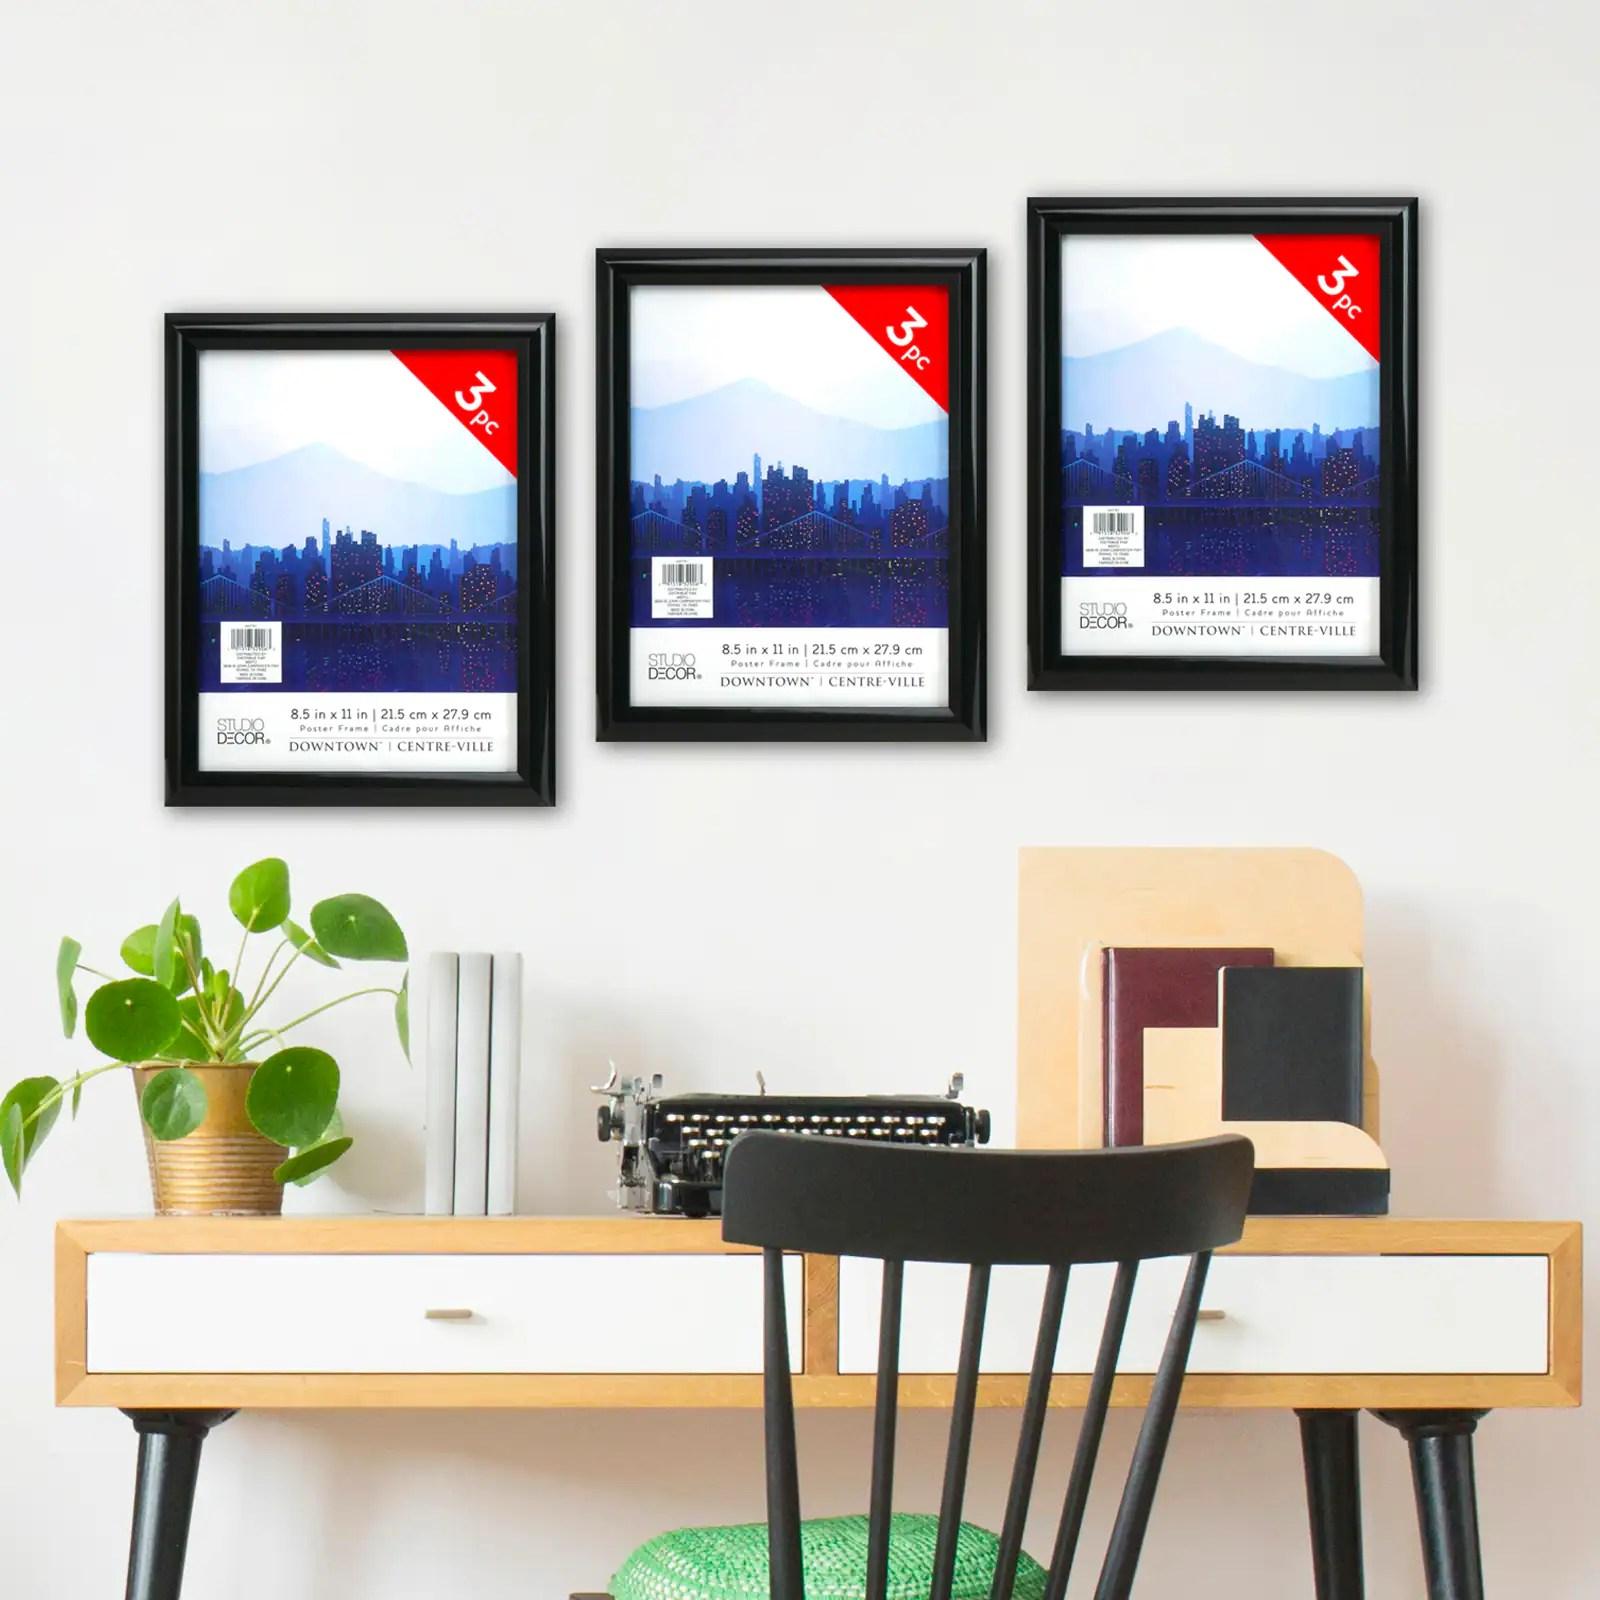 poster frames of varying sizes michaels